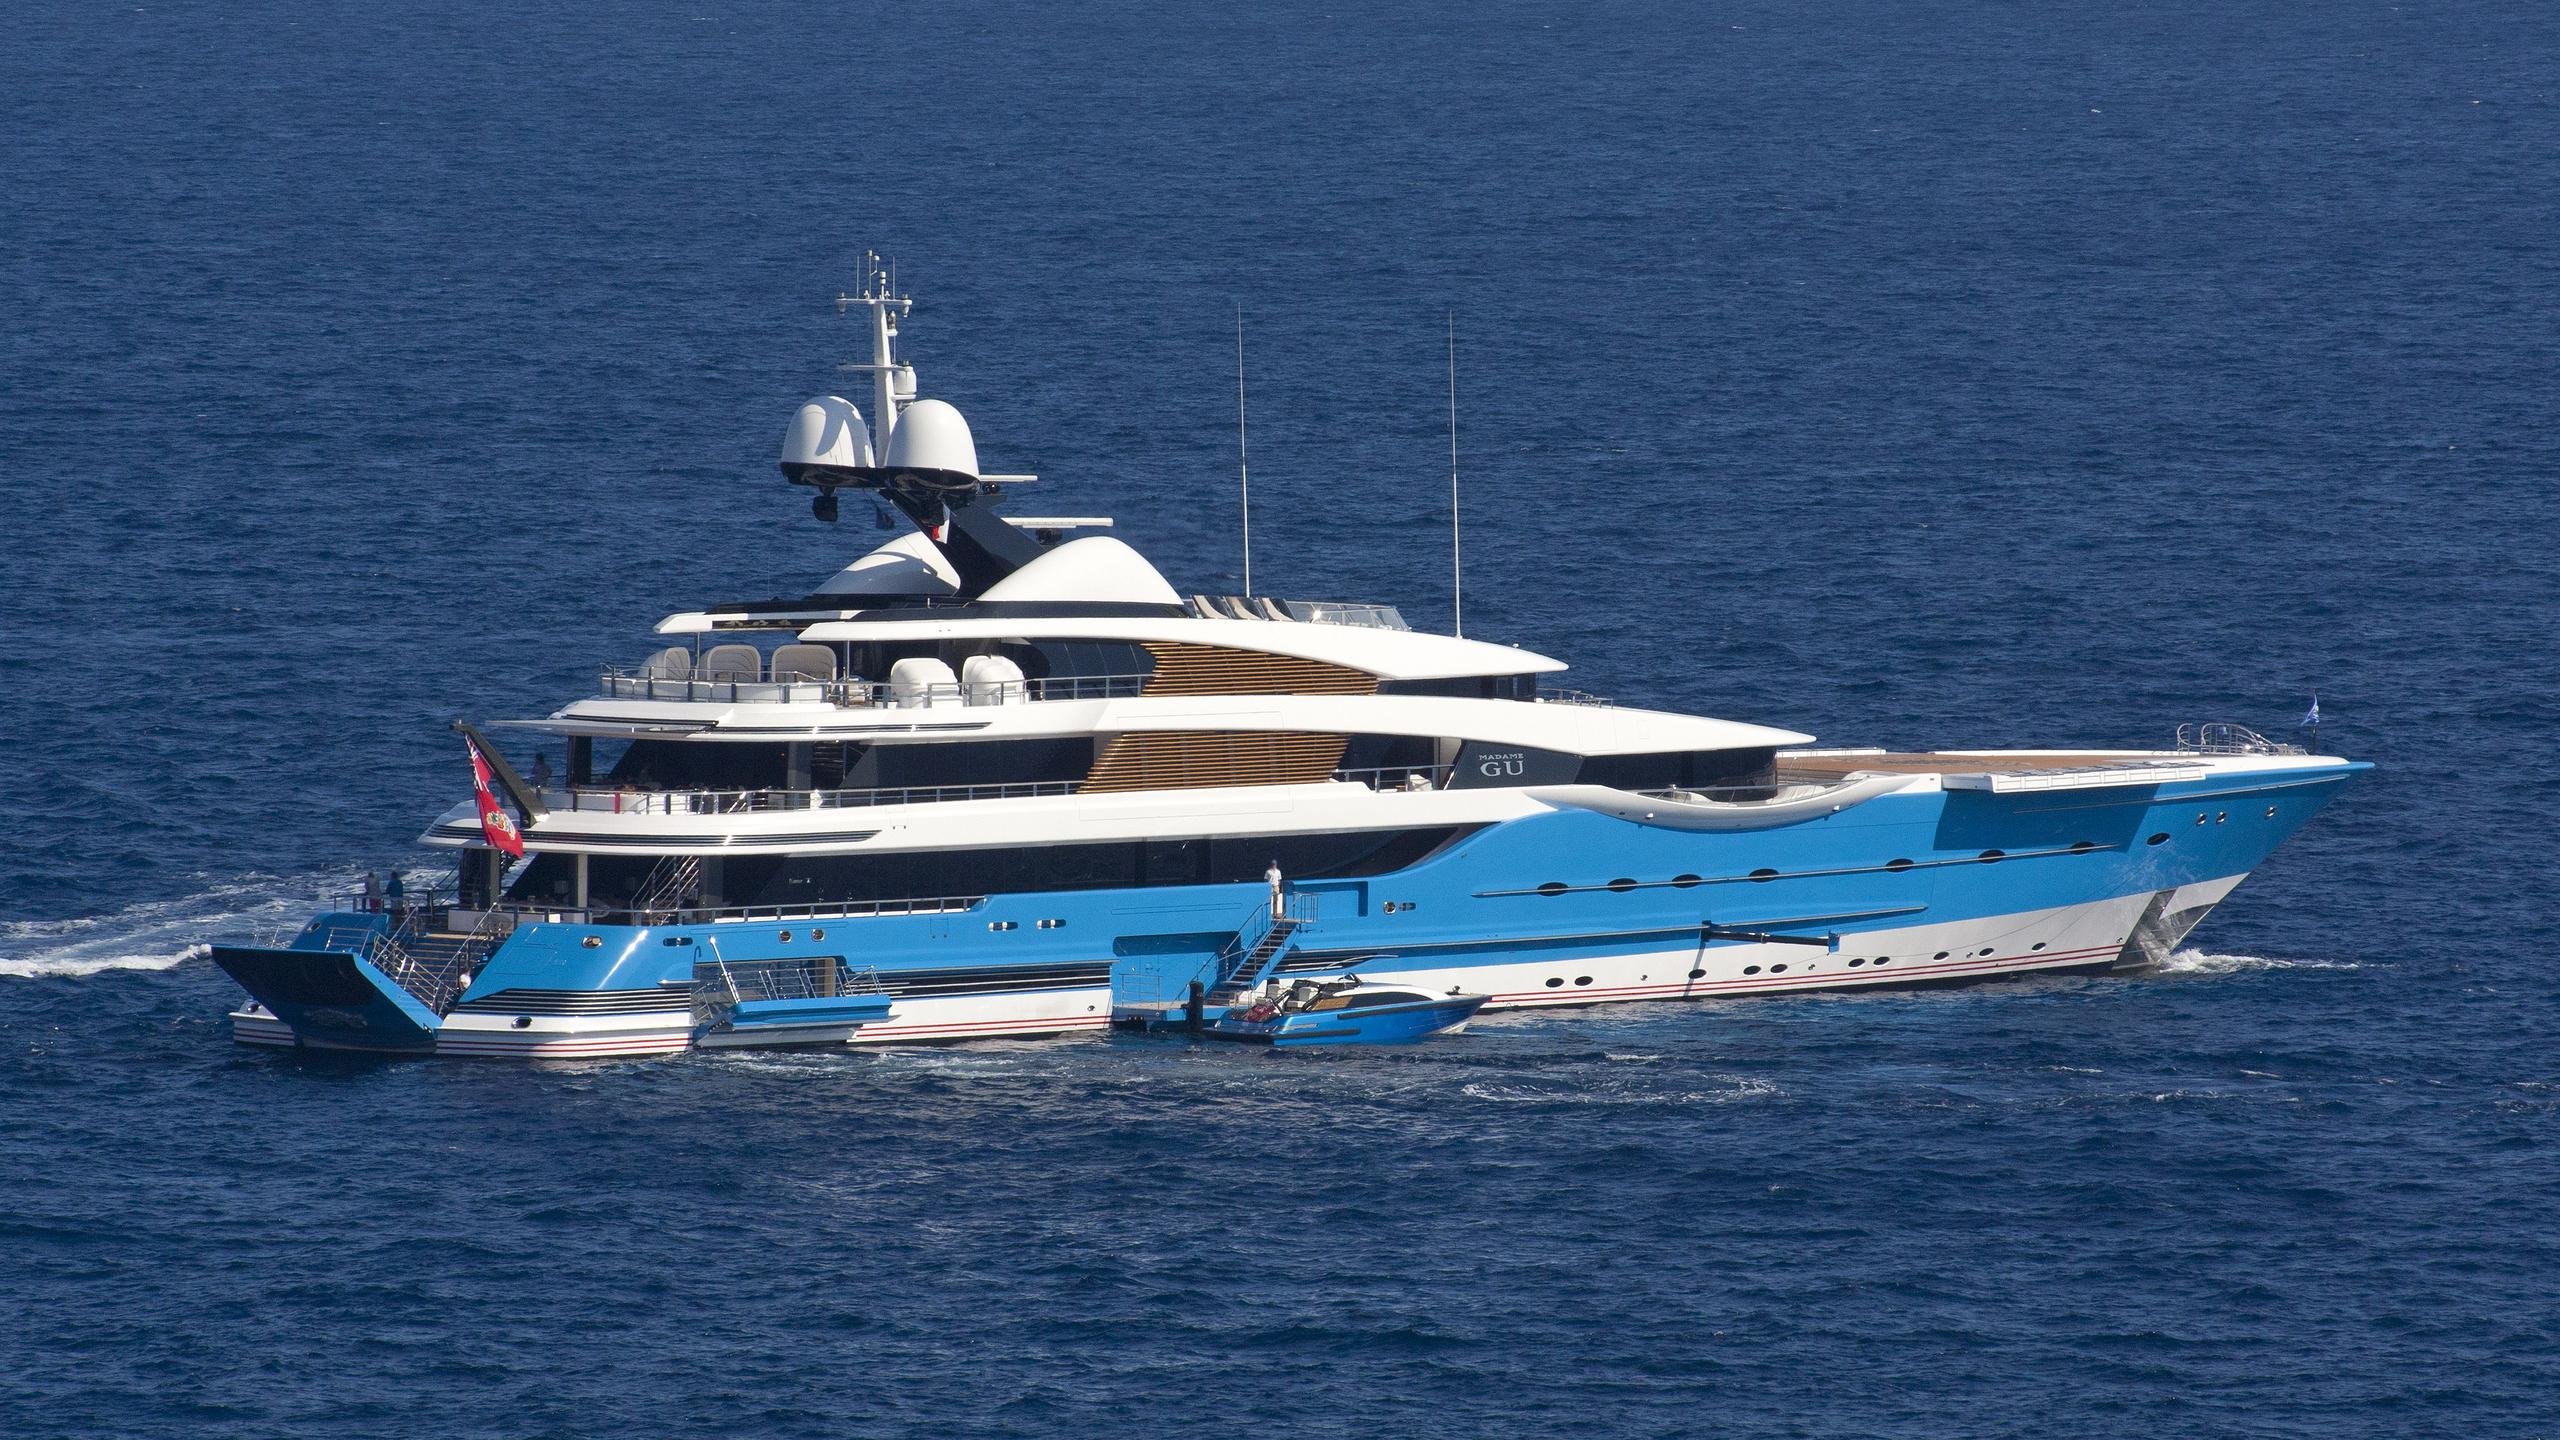 madame-gu-motor-yacht-feadship-2013-99m-profile